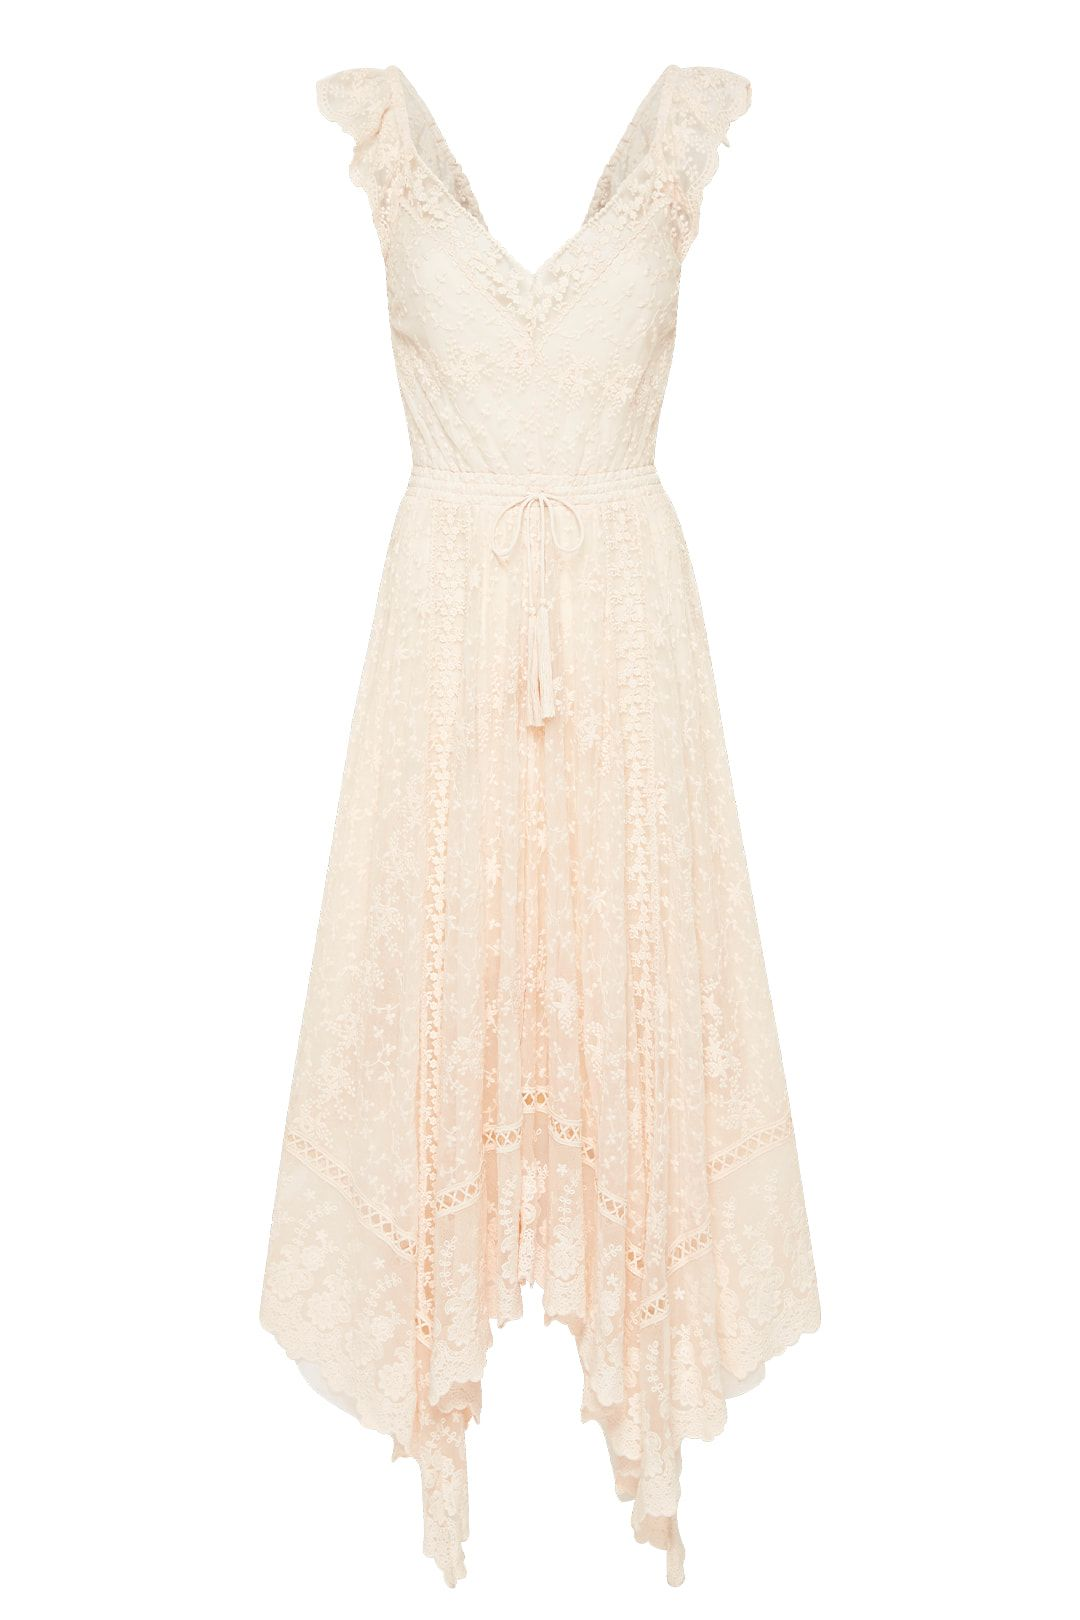 Spell Le Gauze Lace Kerchief Dress Midi Length